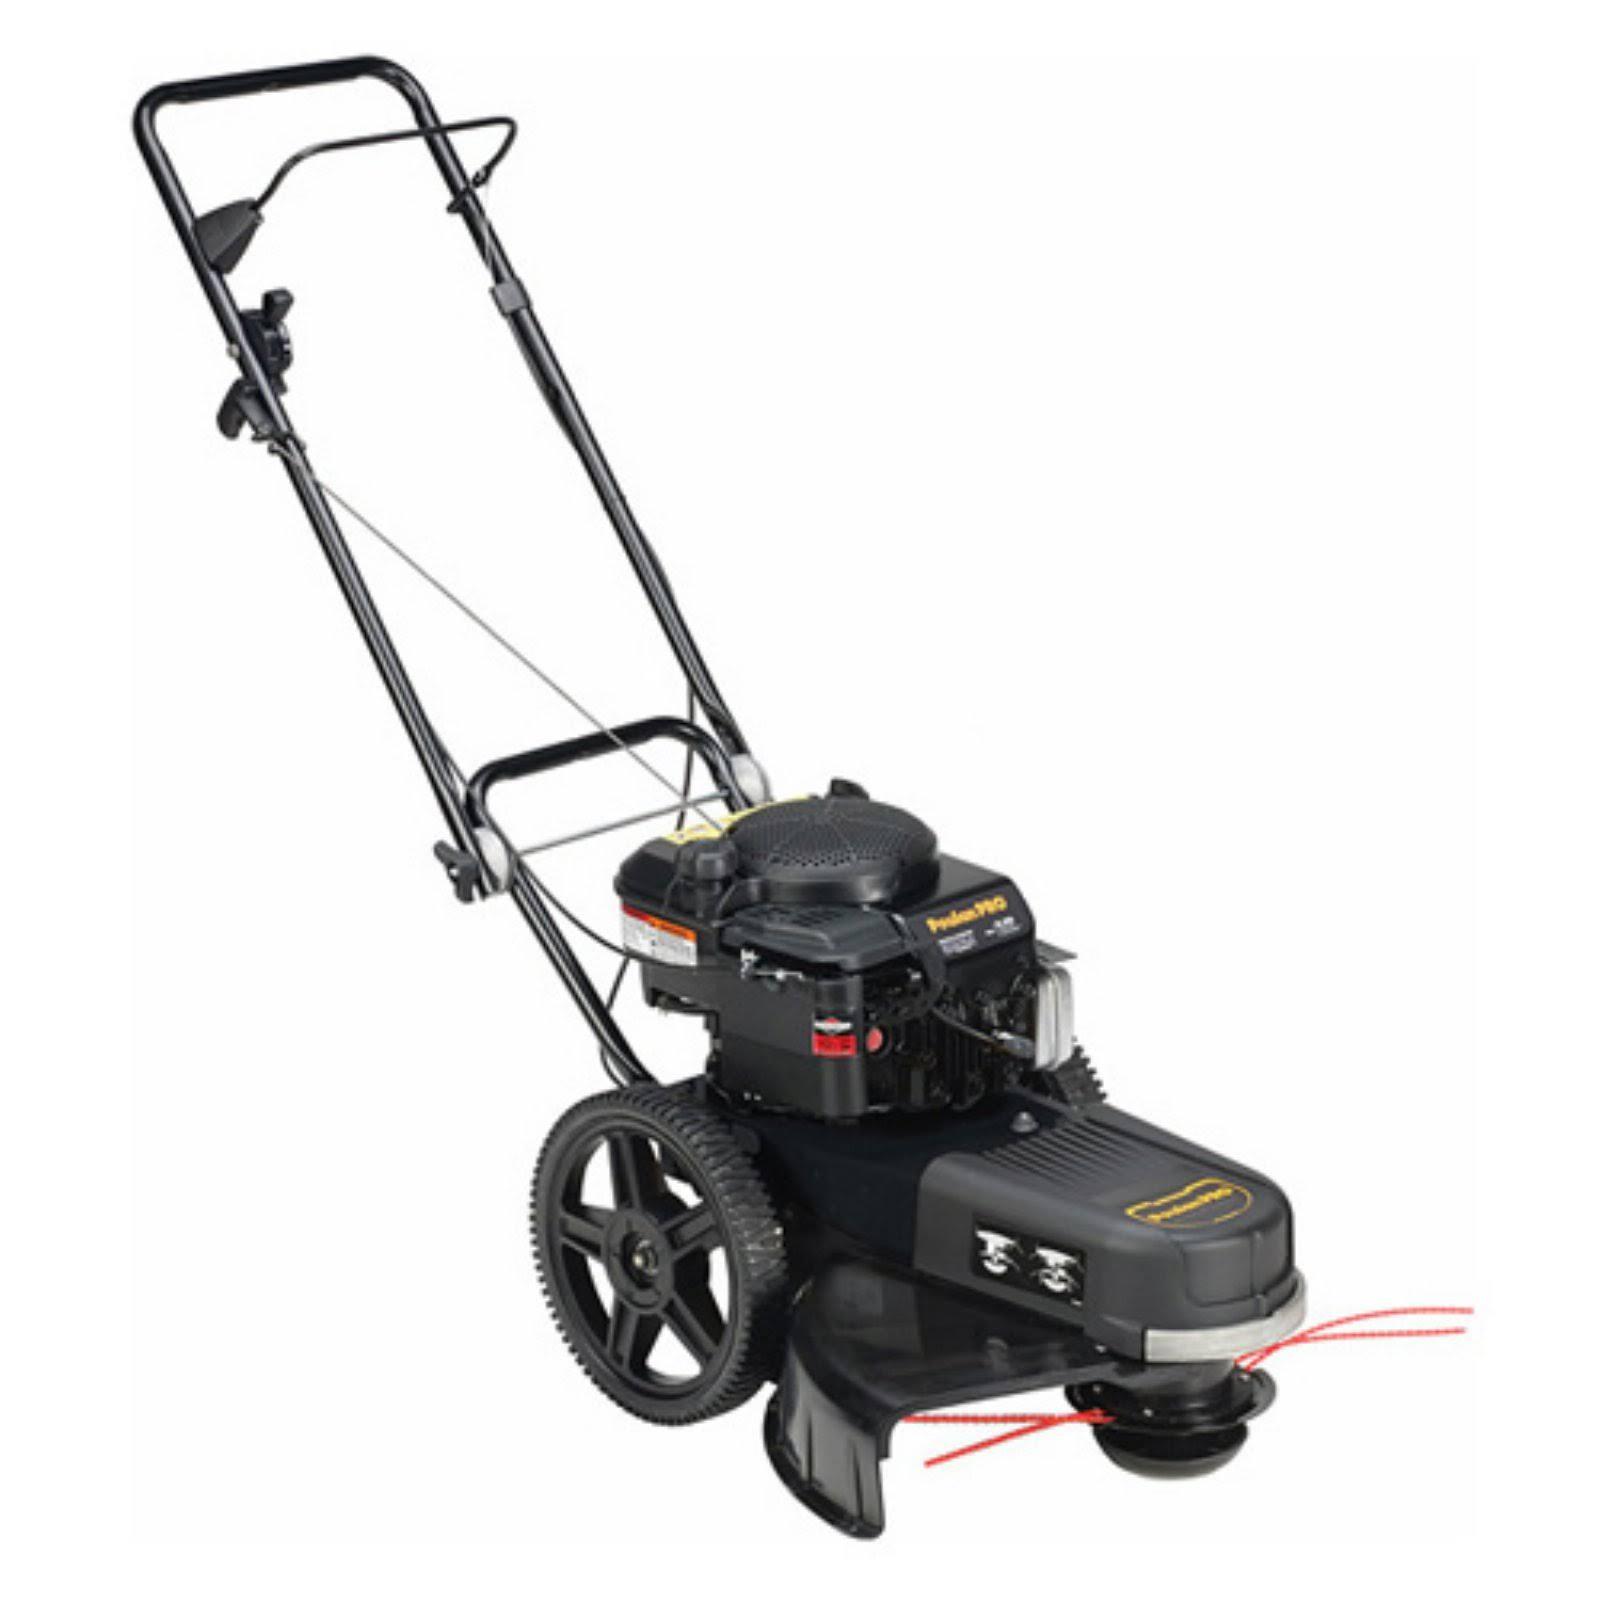 Poulan Pro 22 in. 190cc Gas High-Wheel Lawn Trimmer PR22WT